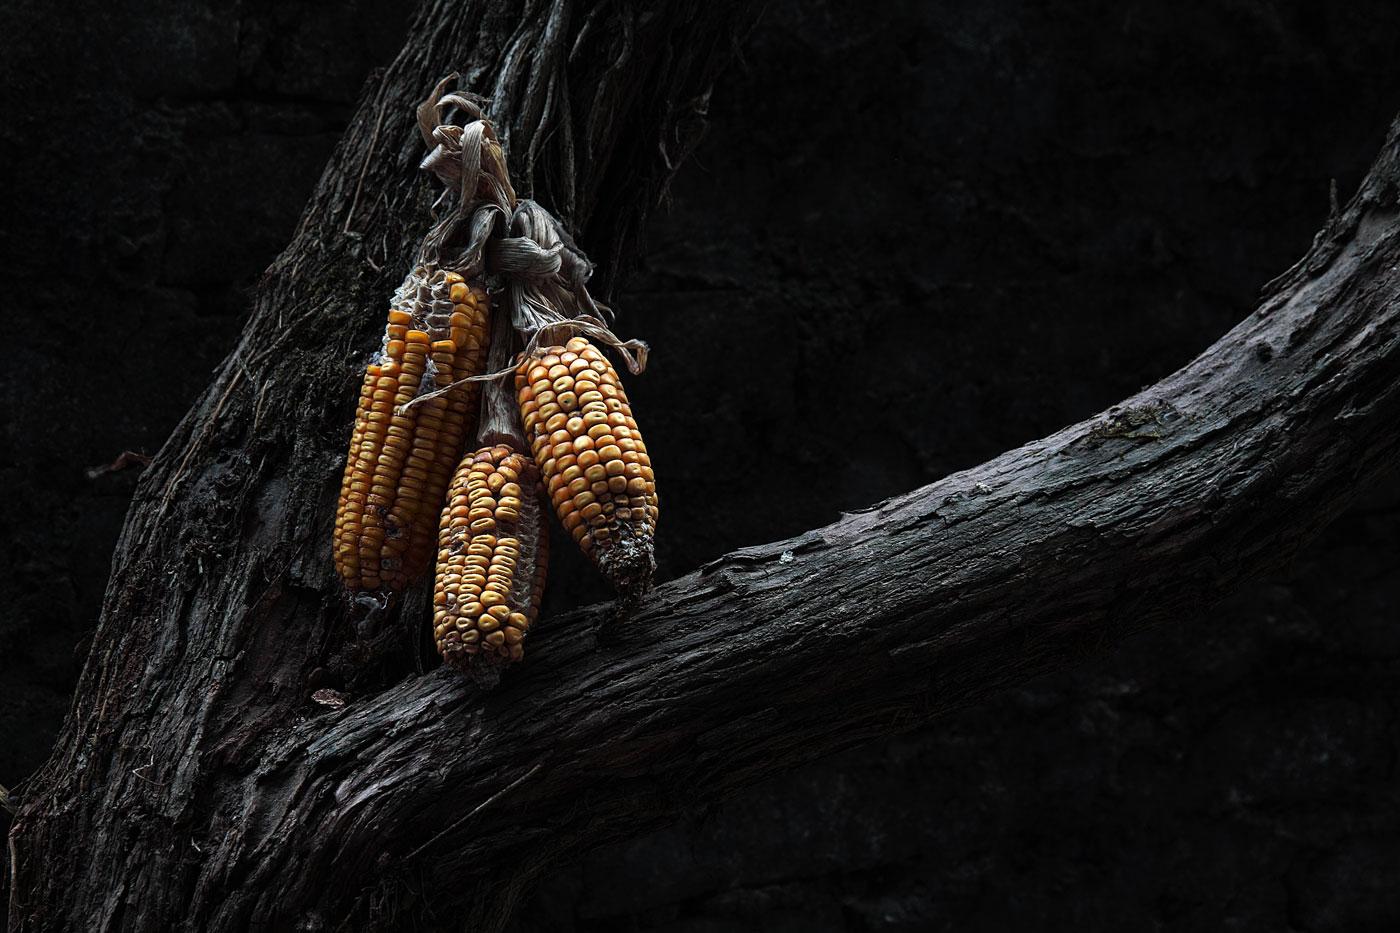 Corn by bingbing51